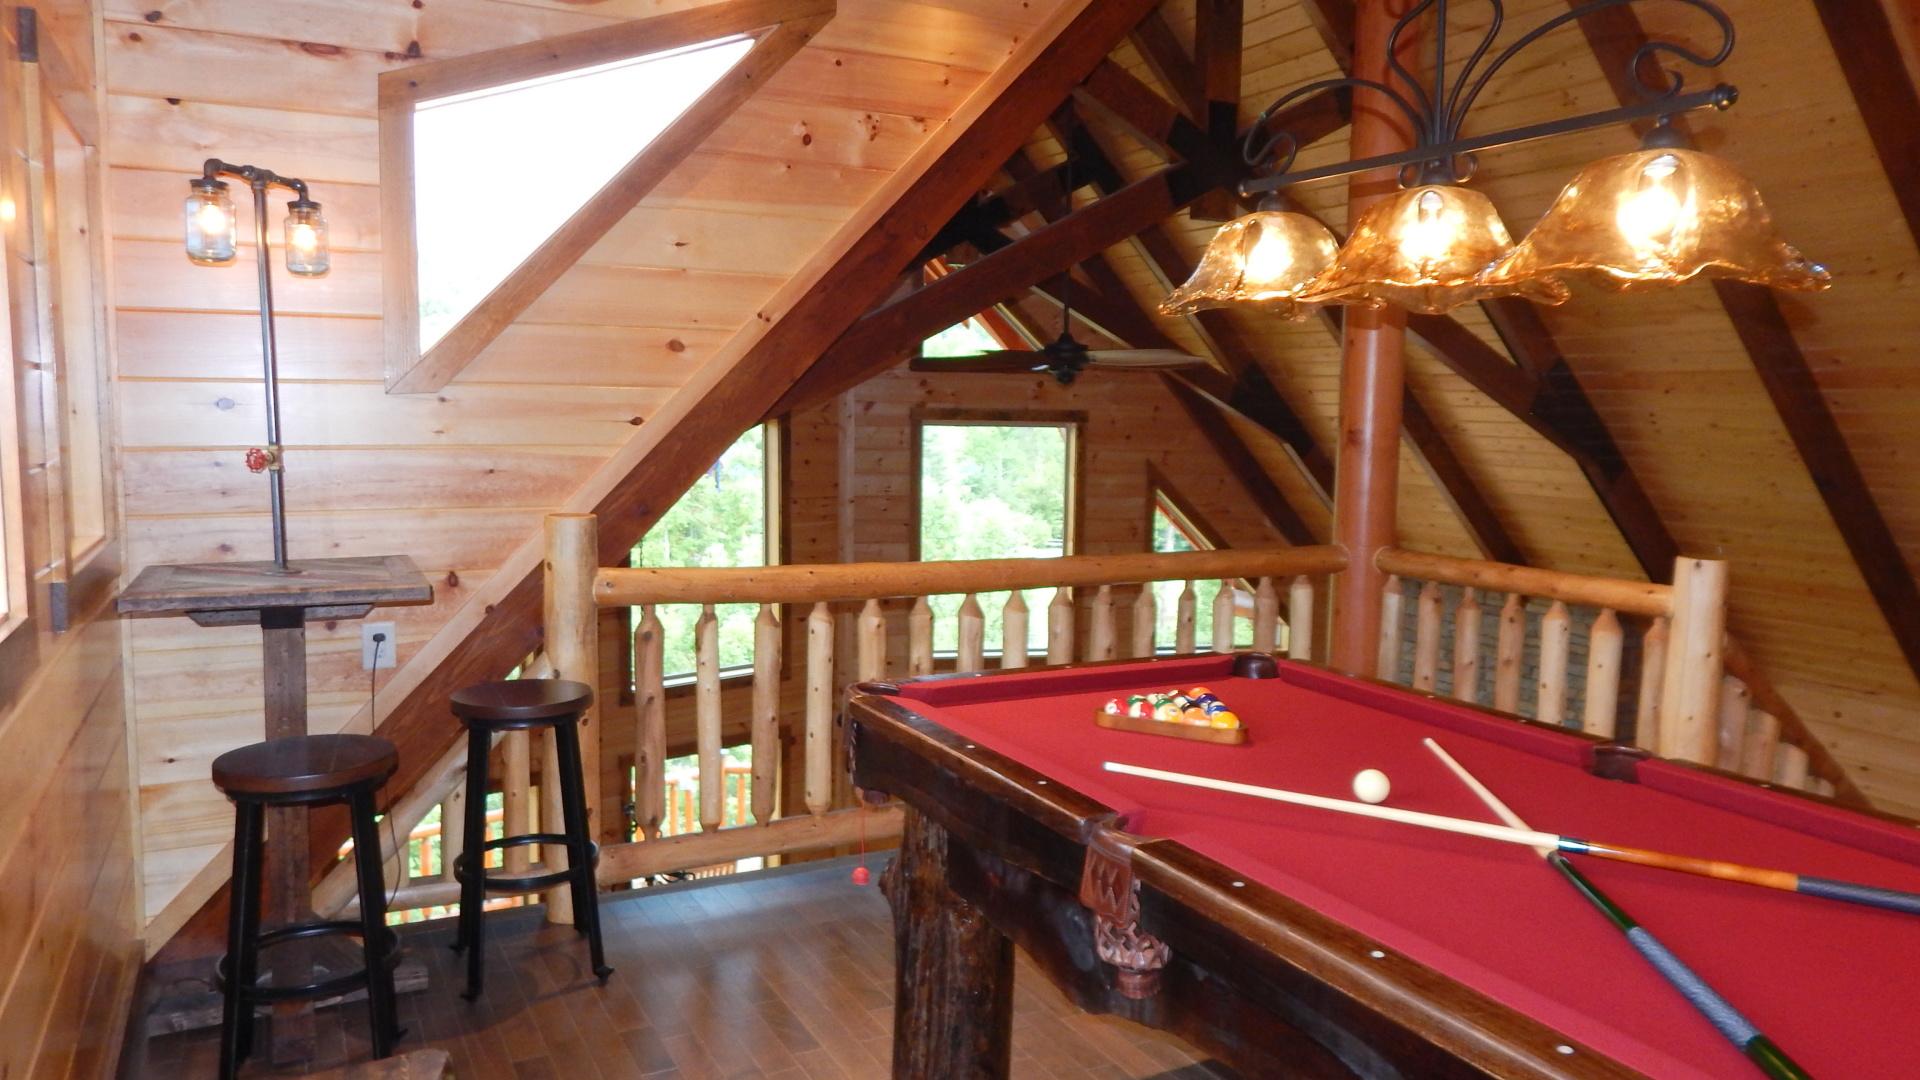 Timber frame ceilings